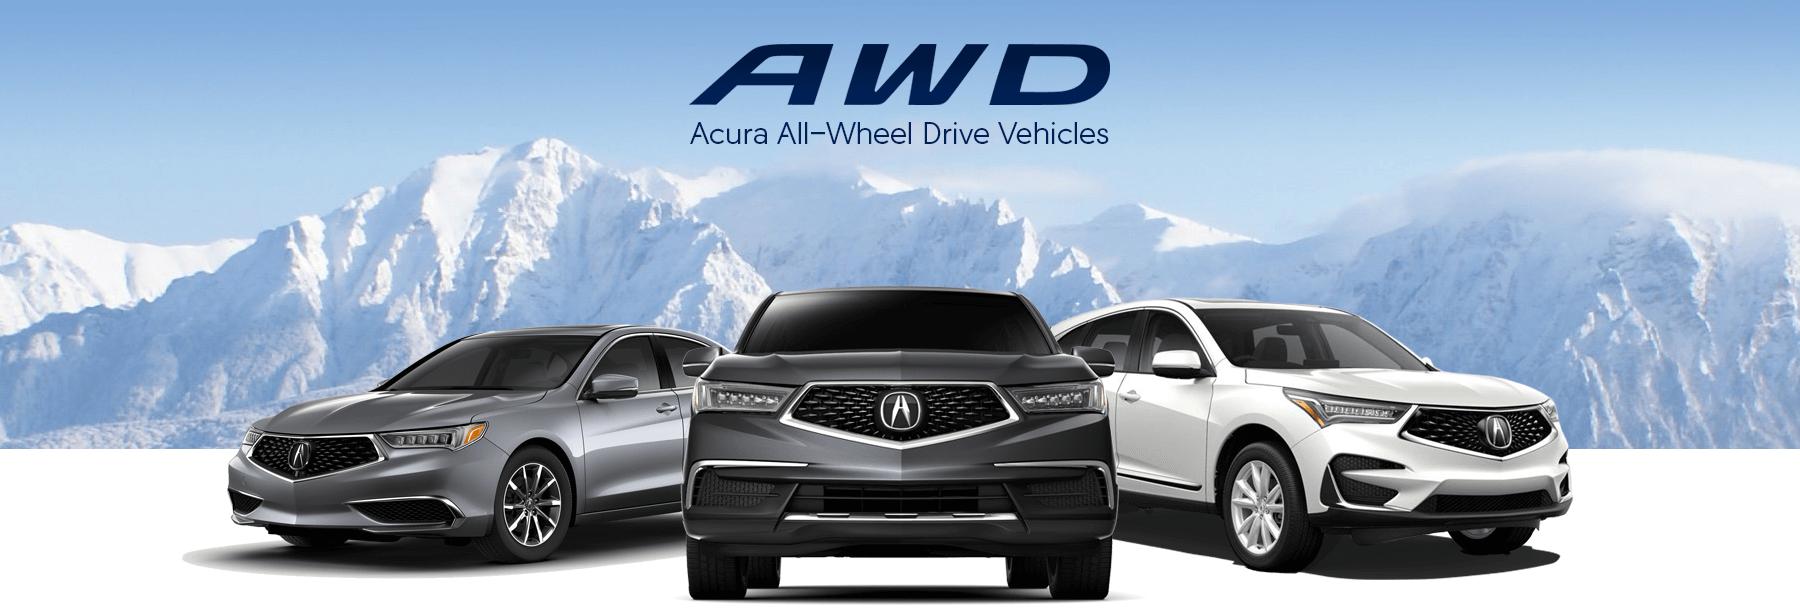 Acura All-Wheel Drive Vehicles